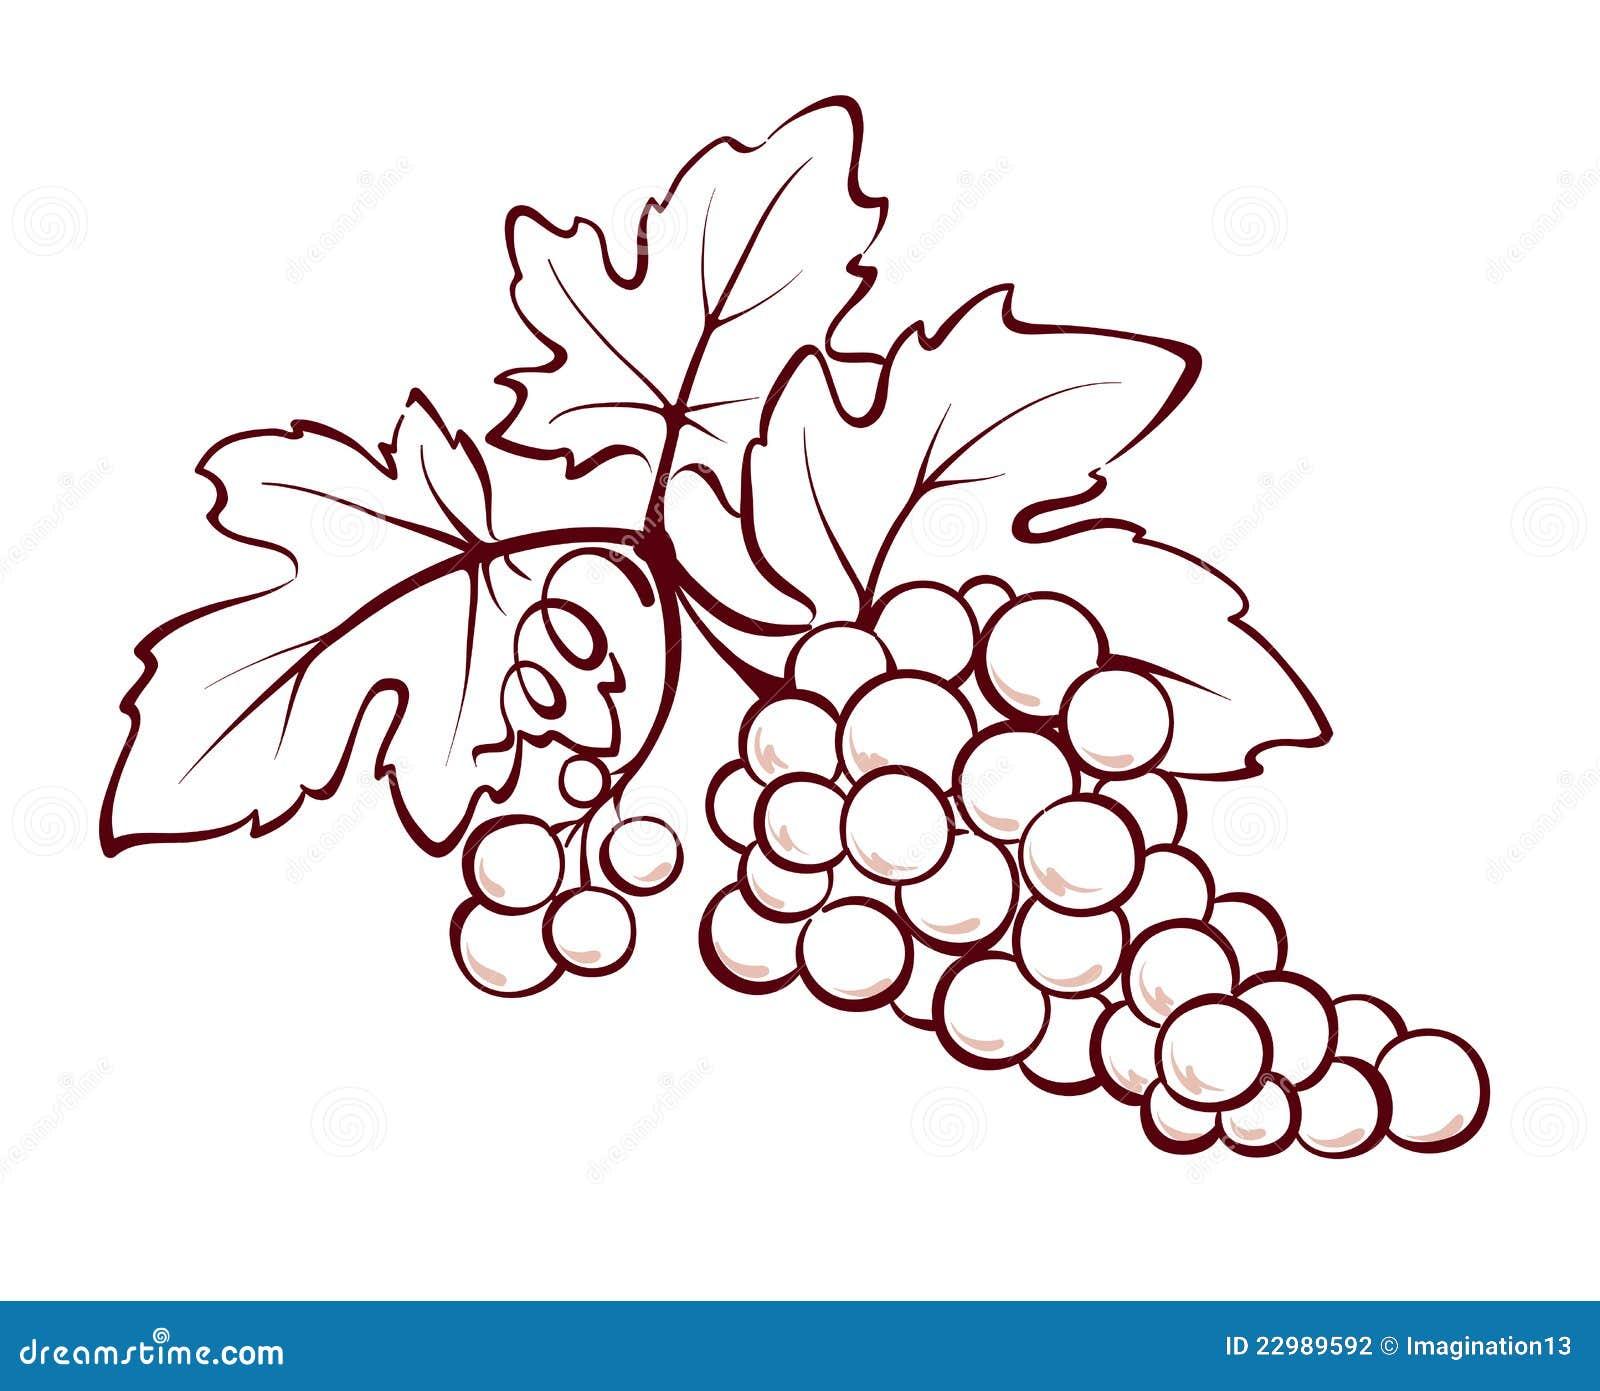 Illustration, decorative design element -- Bunch of grapes.